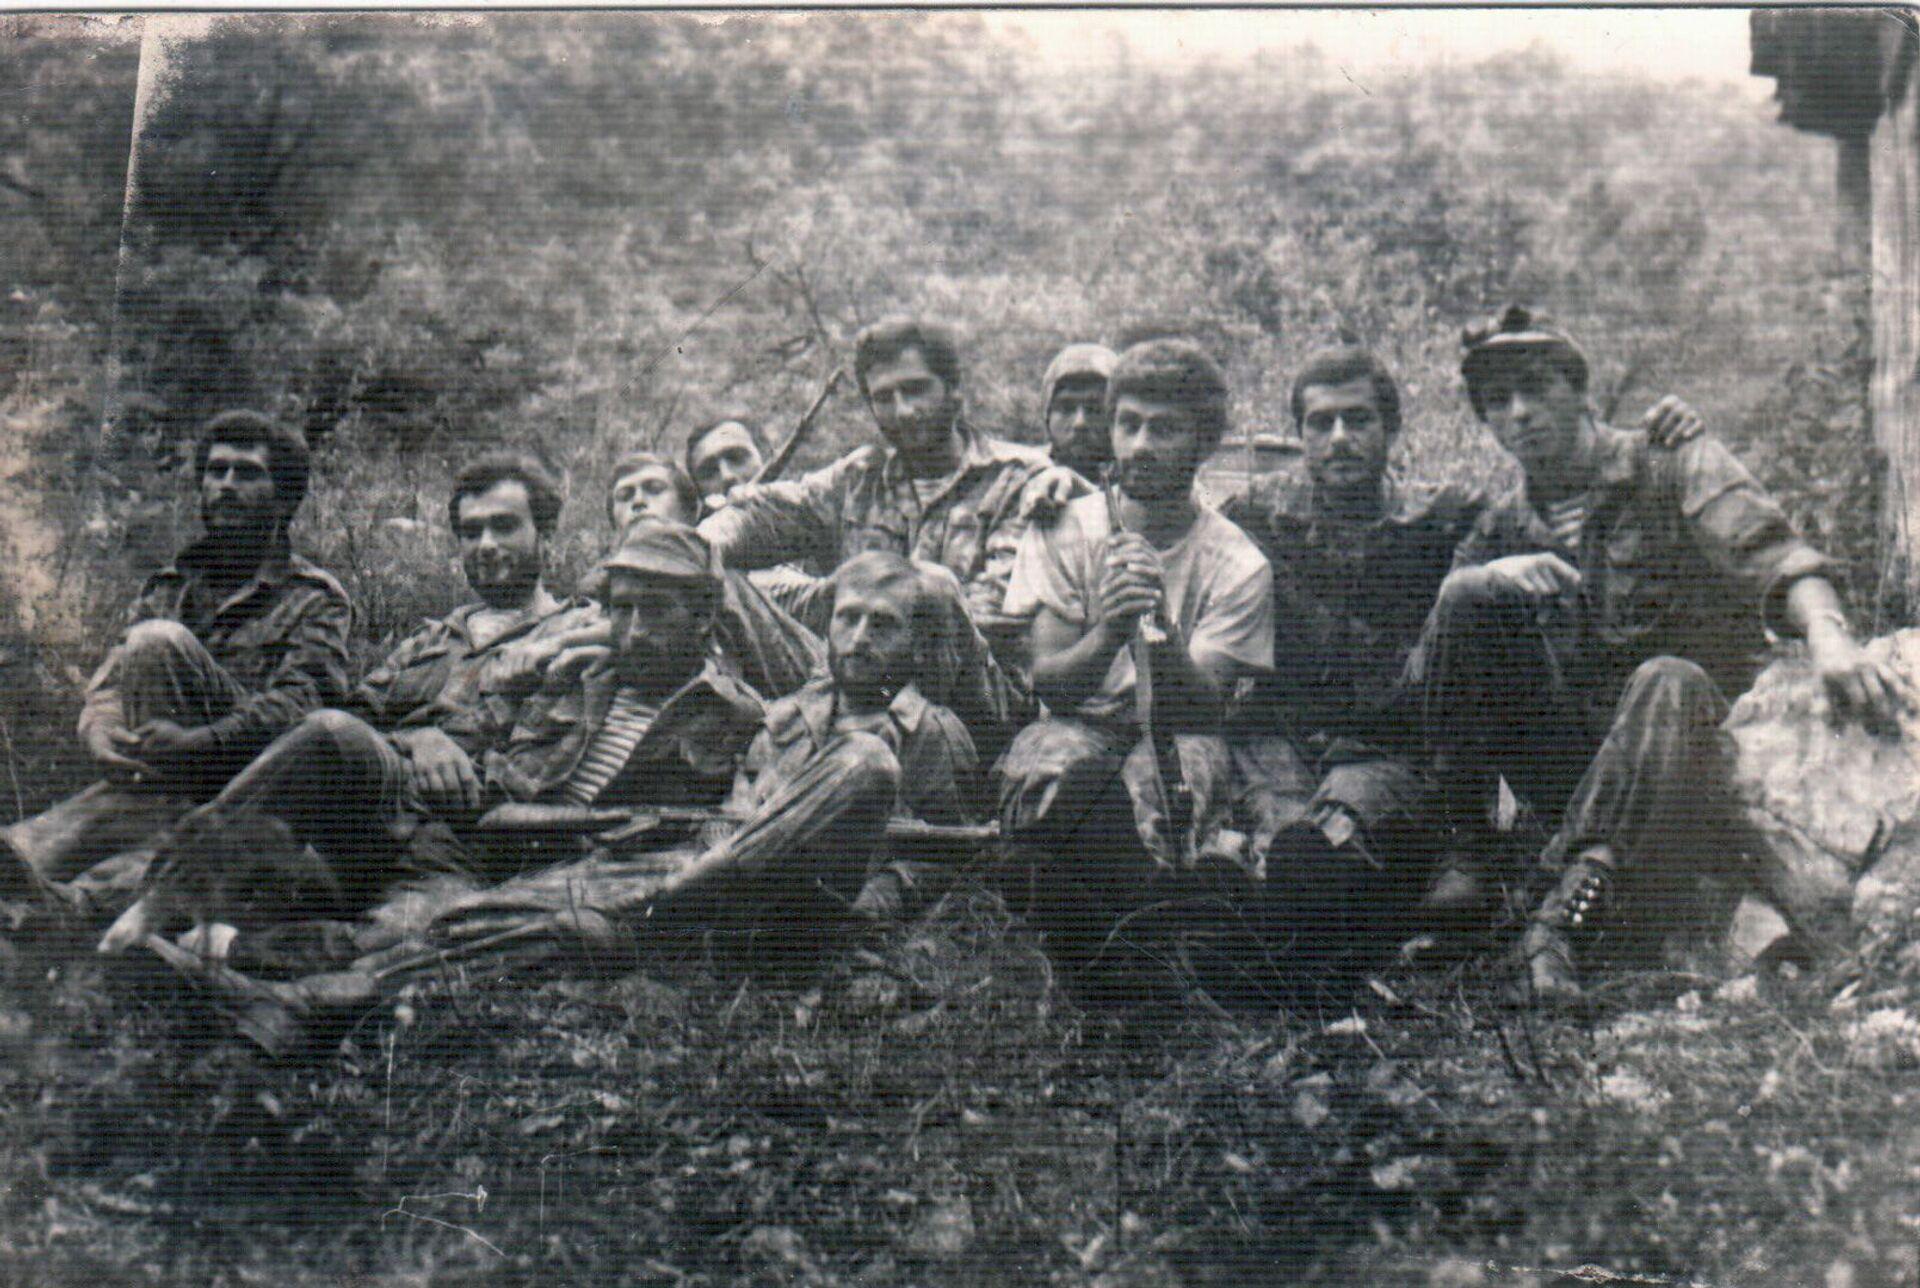 Џьумбер Бениа аибашьцәа рыгәҭа - Sputnik Аҧсны, 1920, 12.10.2021